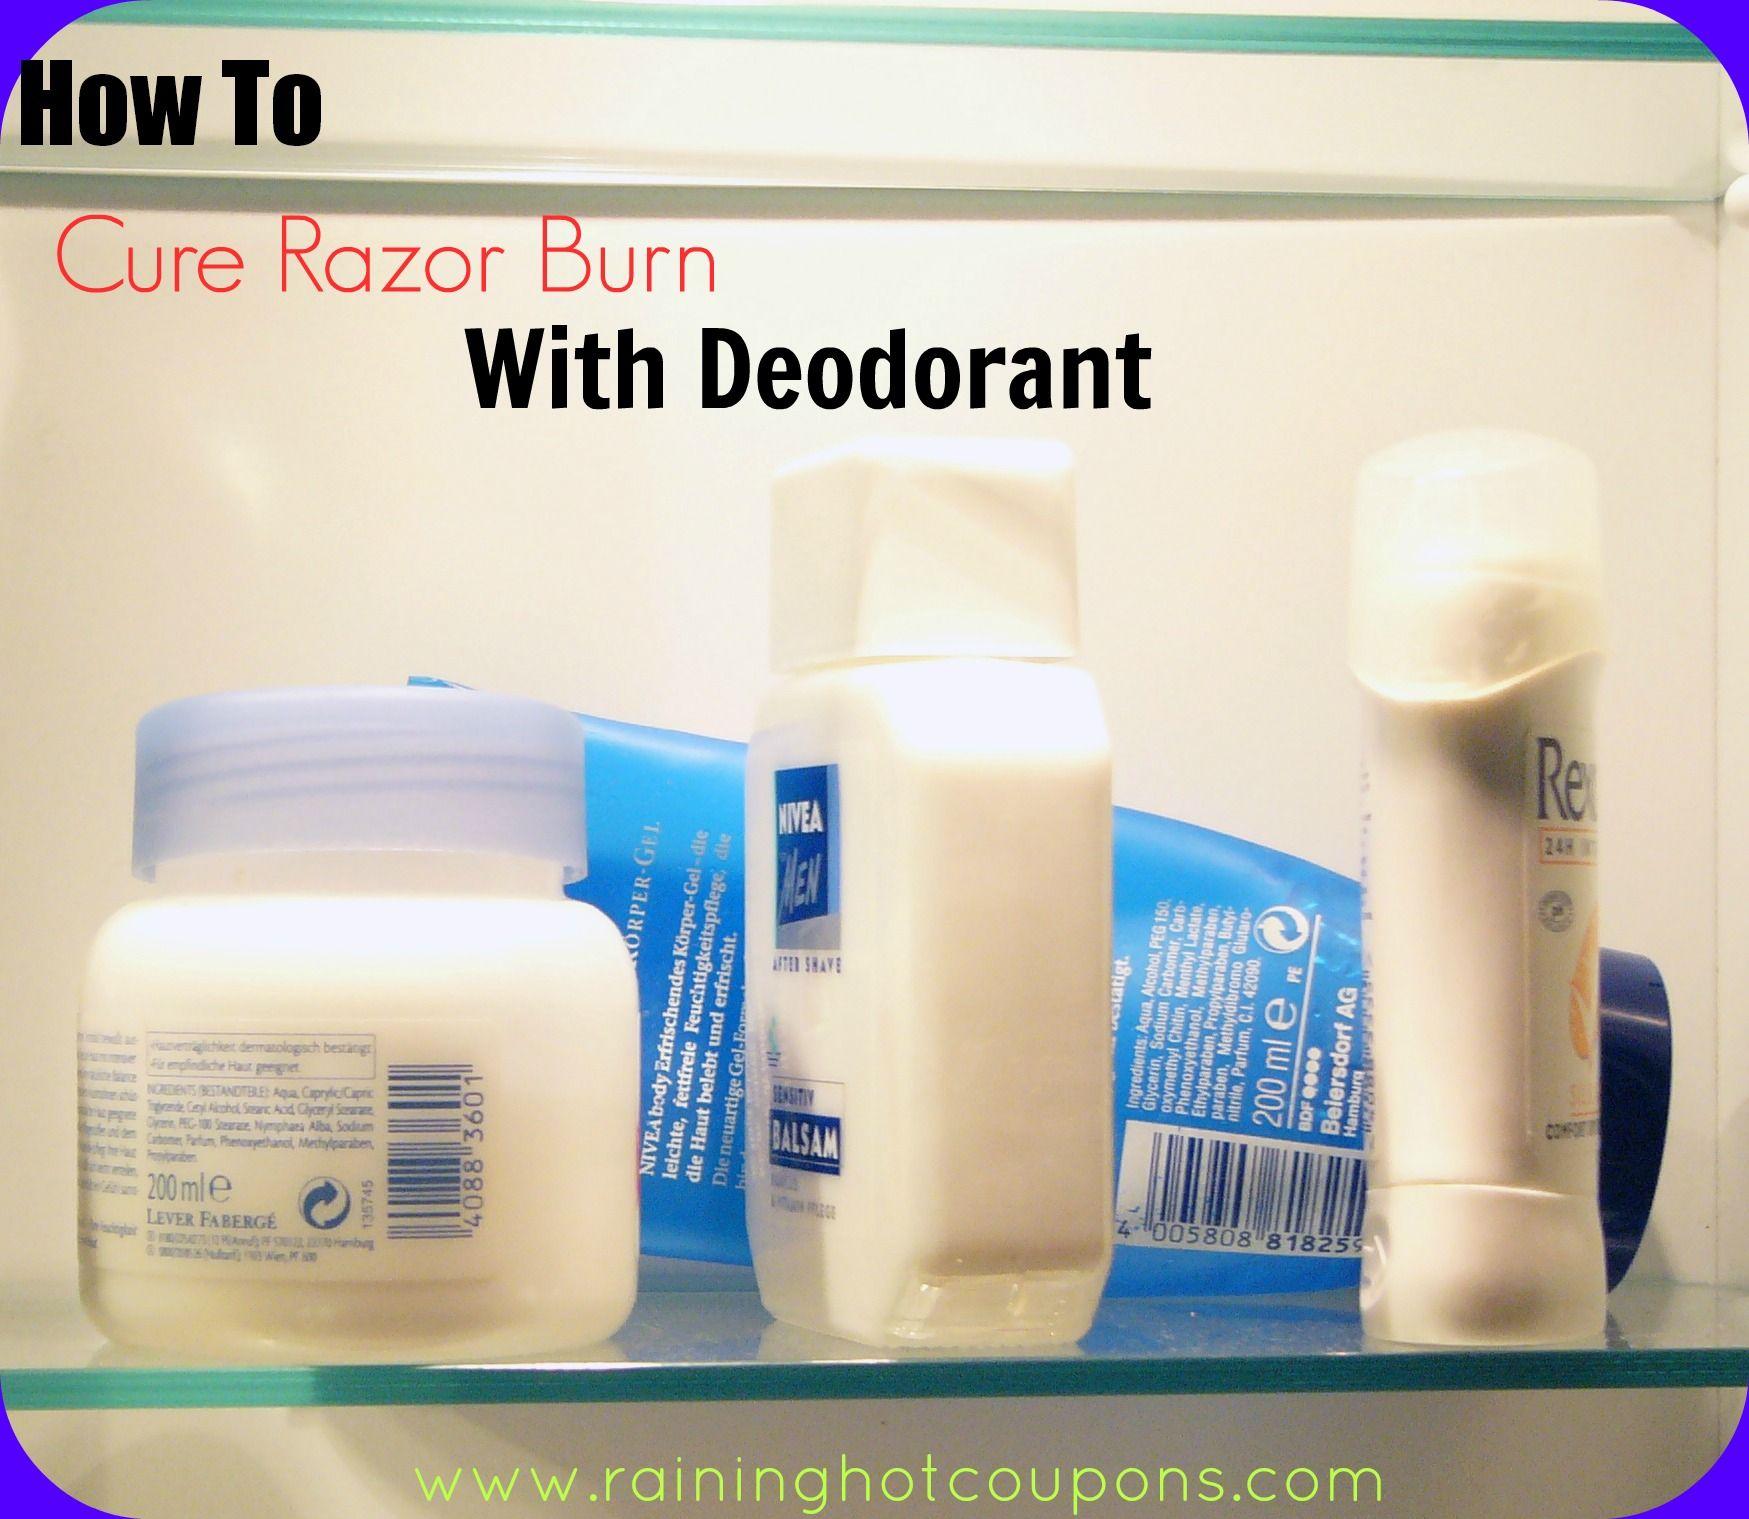 how to cure razor burn with deodorant | tips | pinterest | razor